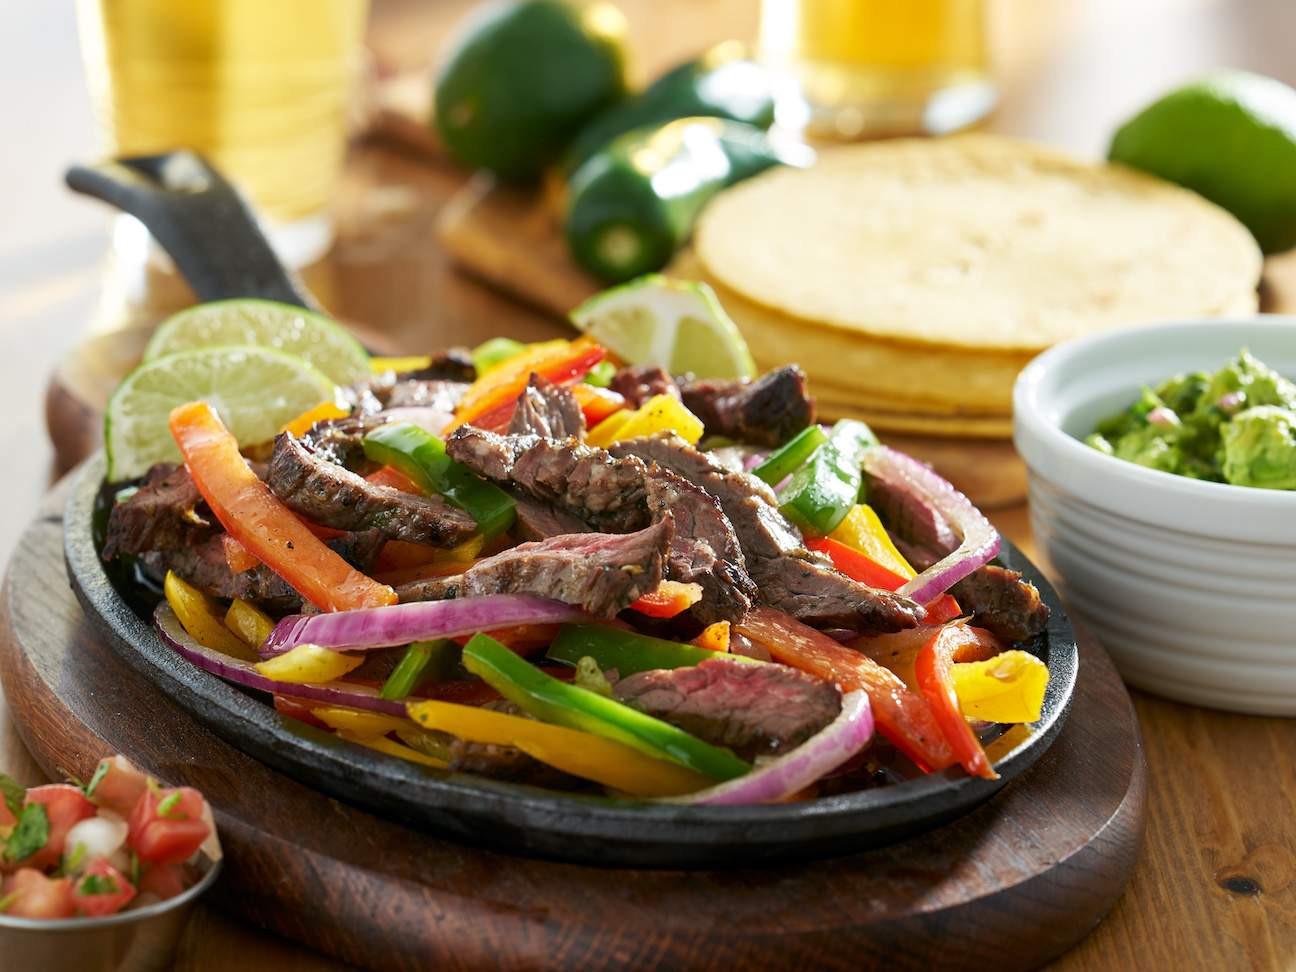 Beef Fajita Meat